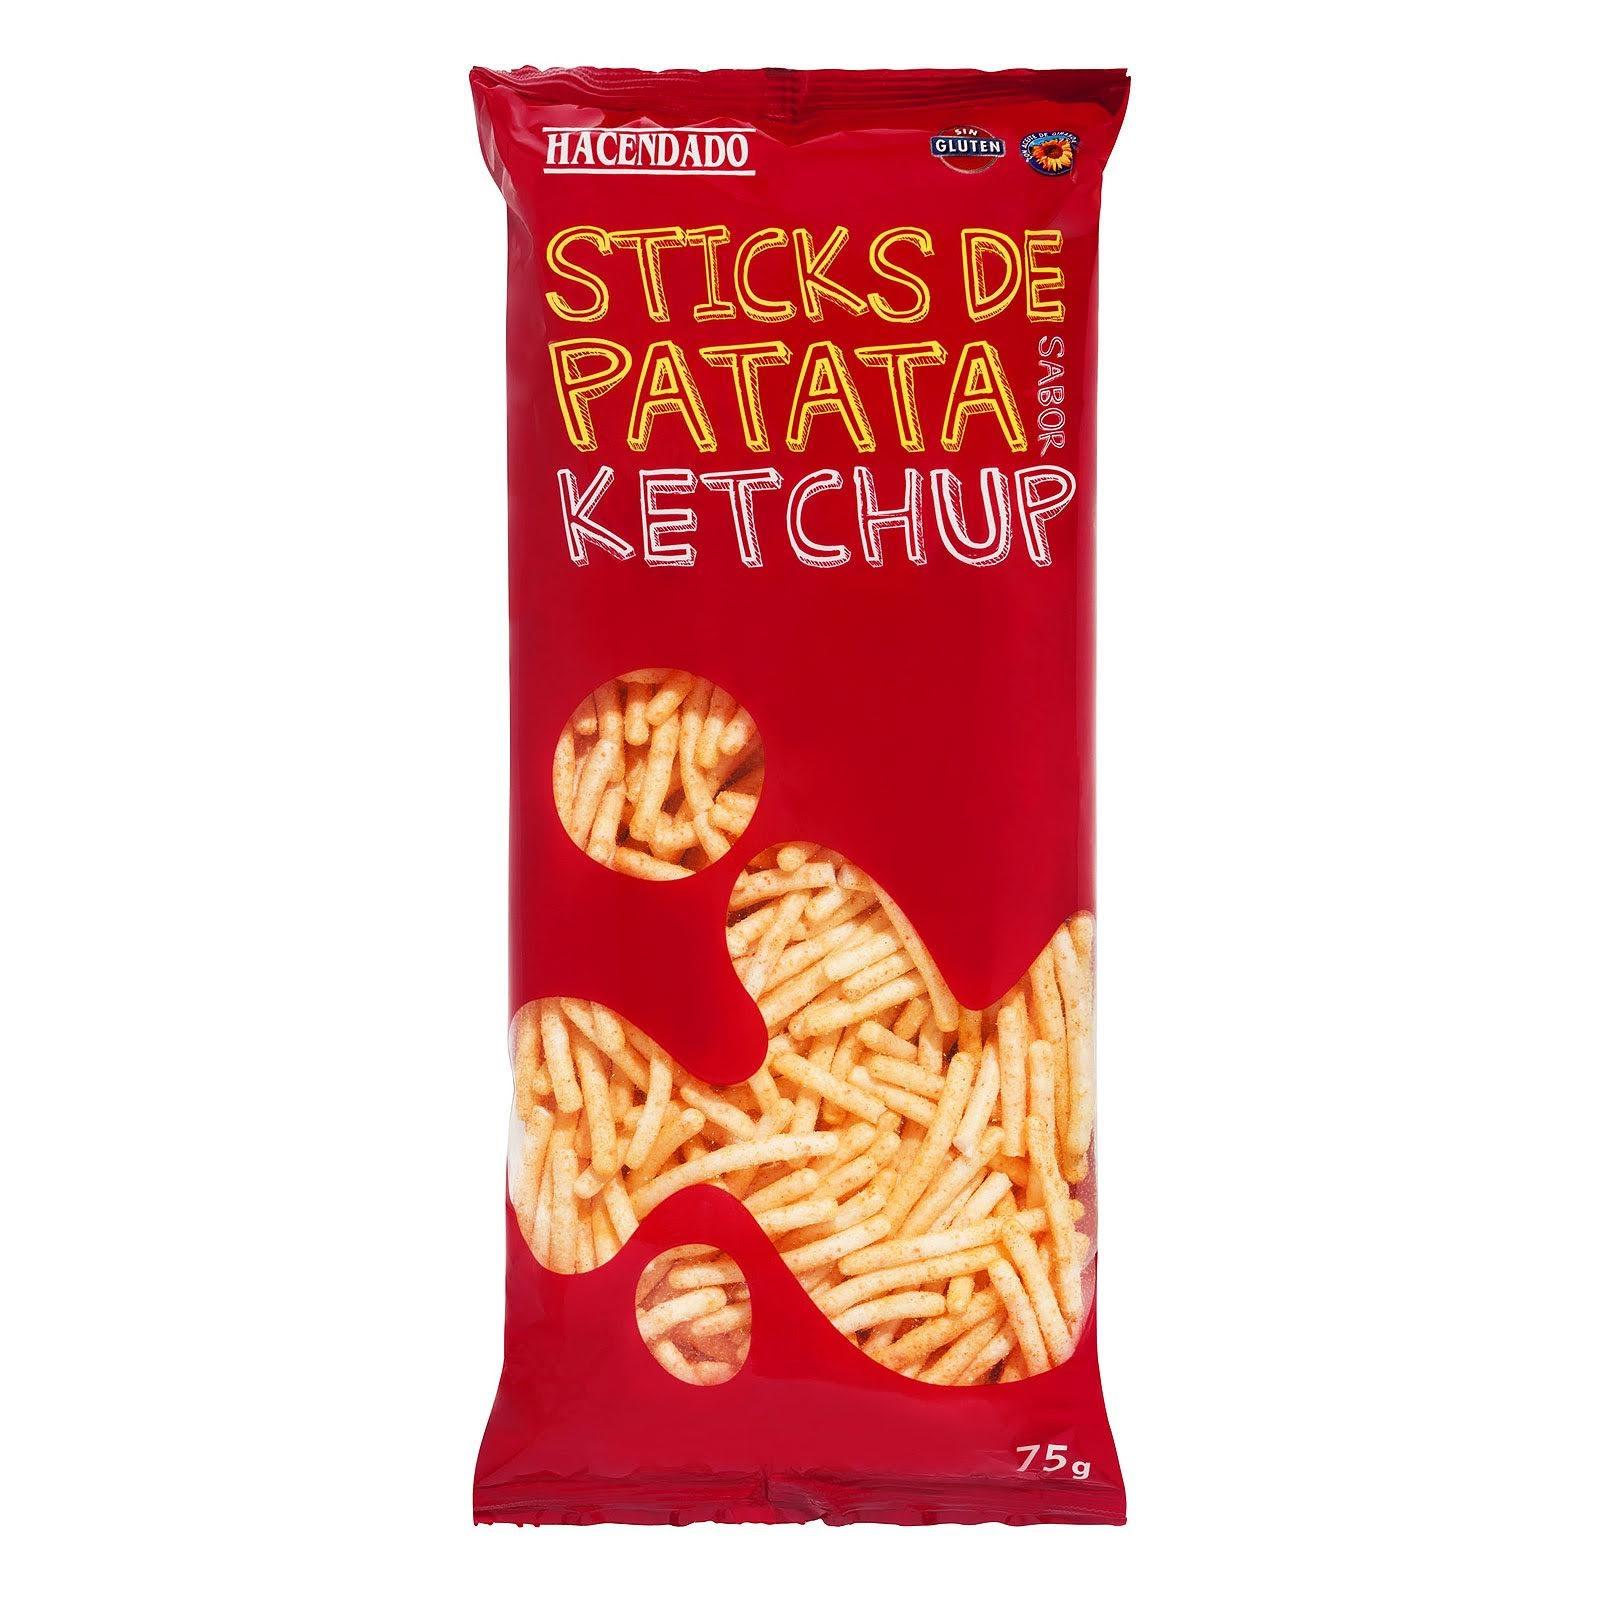 Sticks de patata sabor ketchup Hacendado